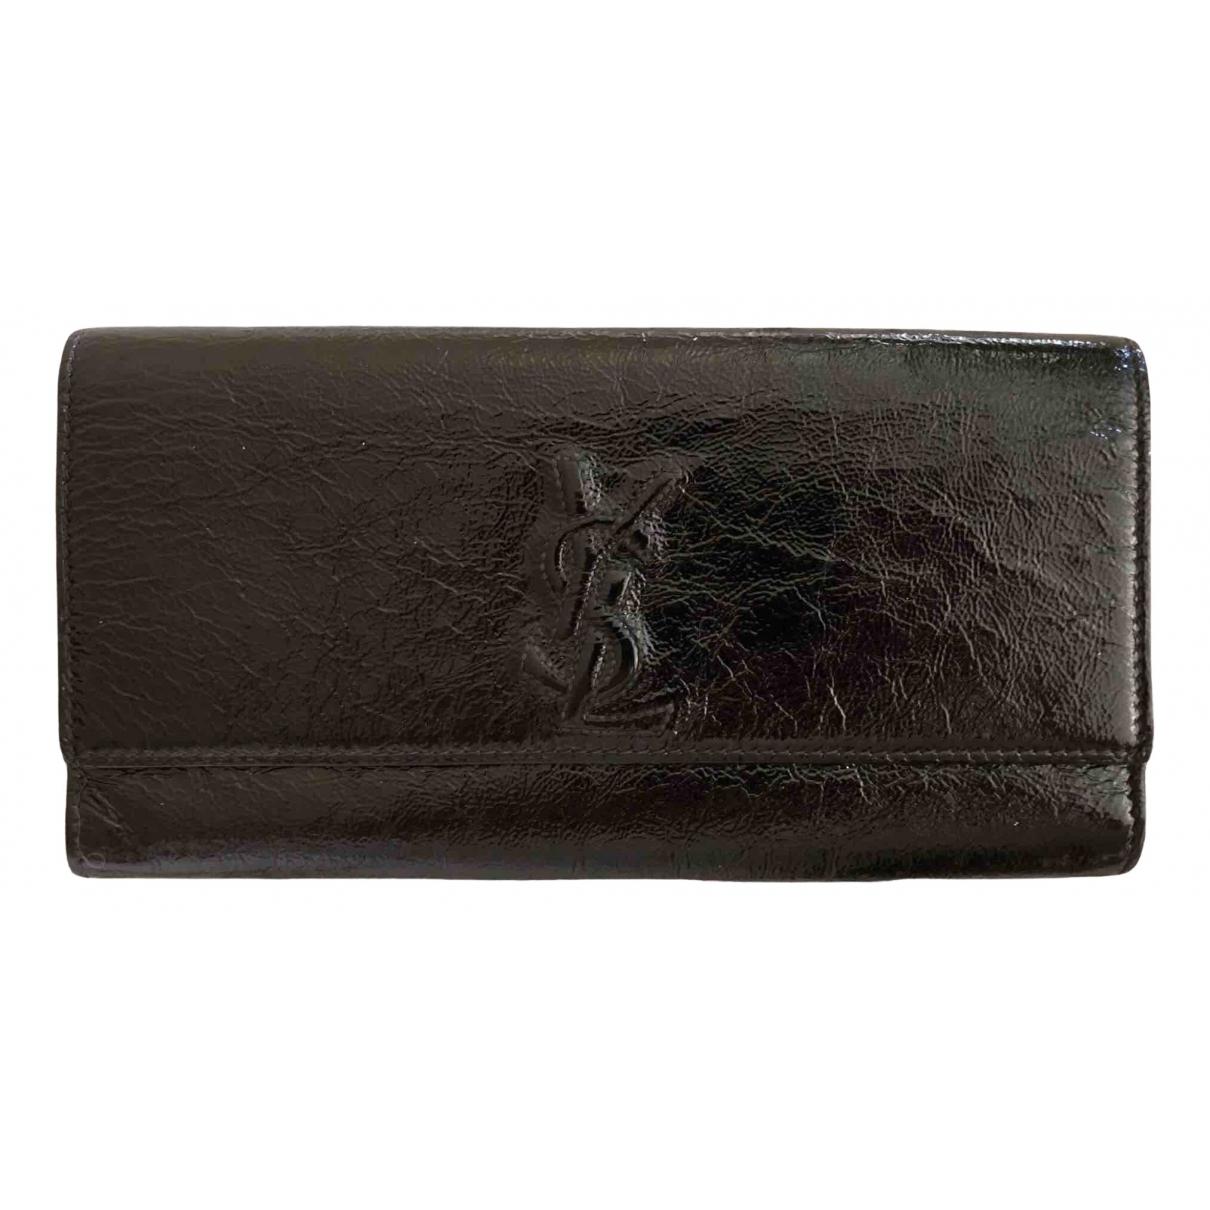 Yves Saint Laurent N Black Patent leather Clutch bag for Women N